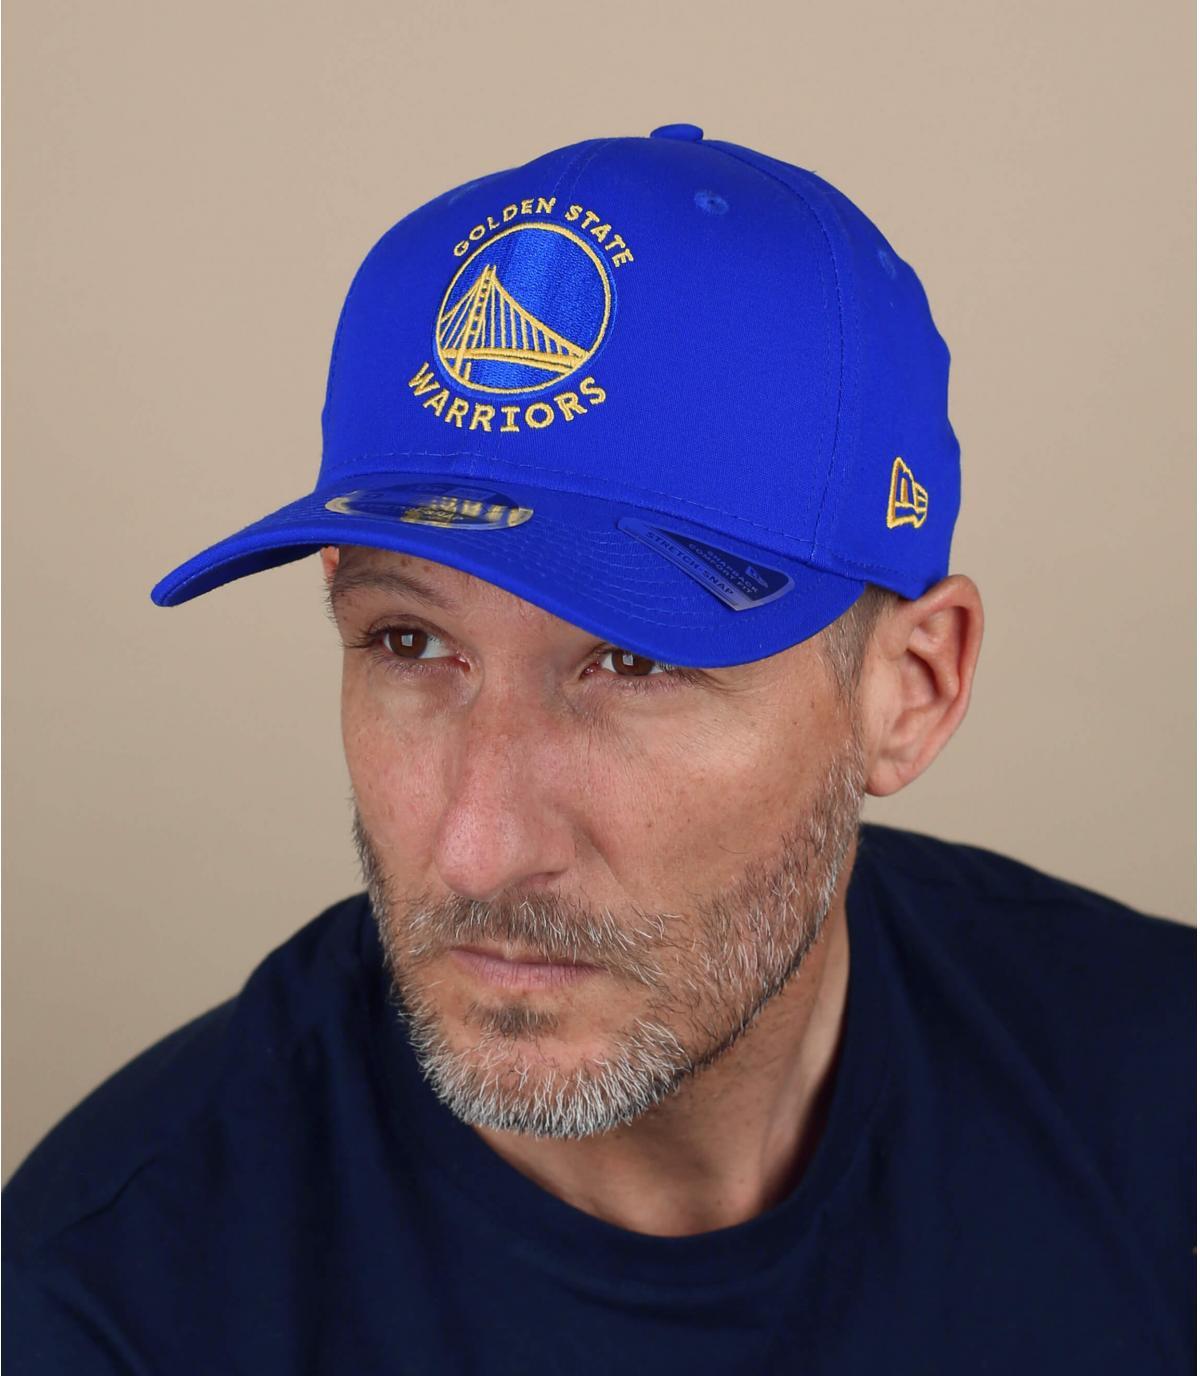 Cappellino blu Warriors